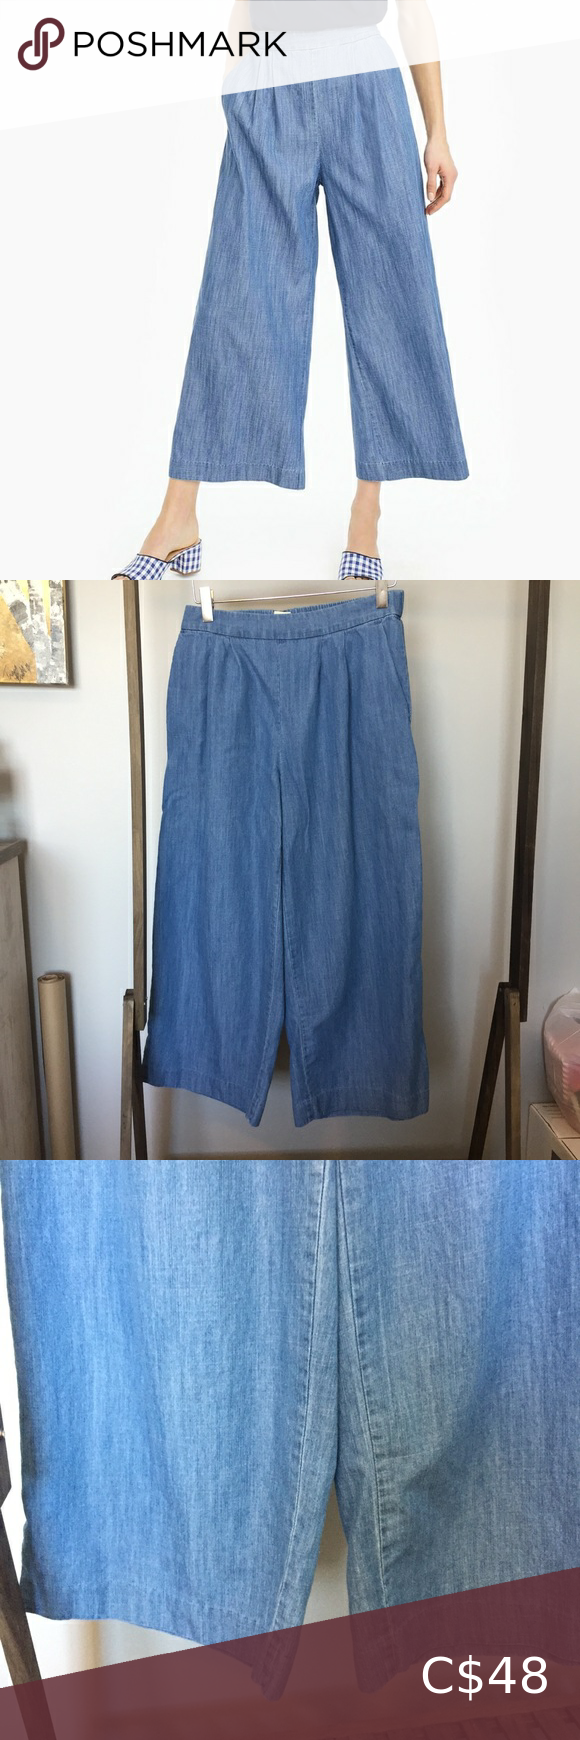 J Crew Denim Wide Leg Pants